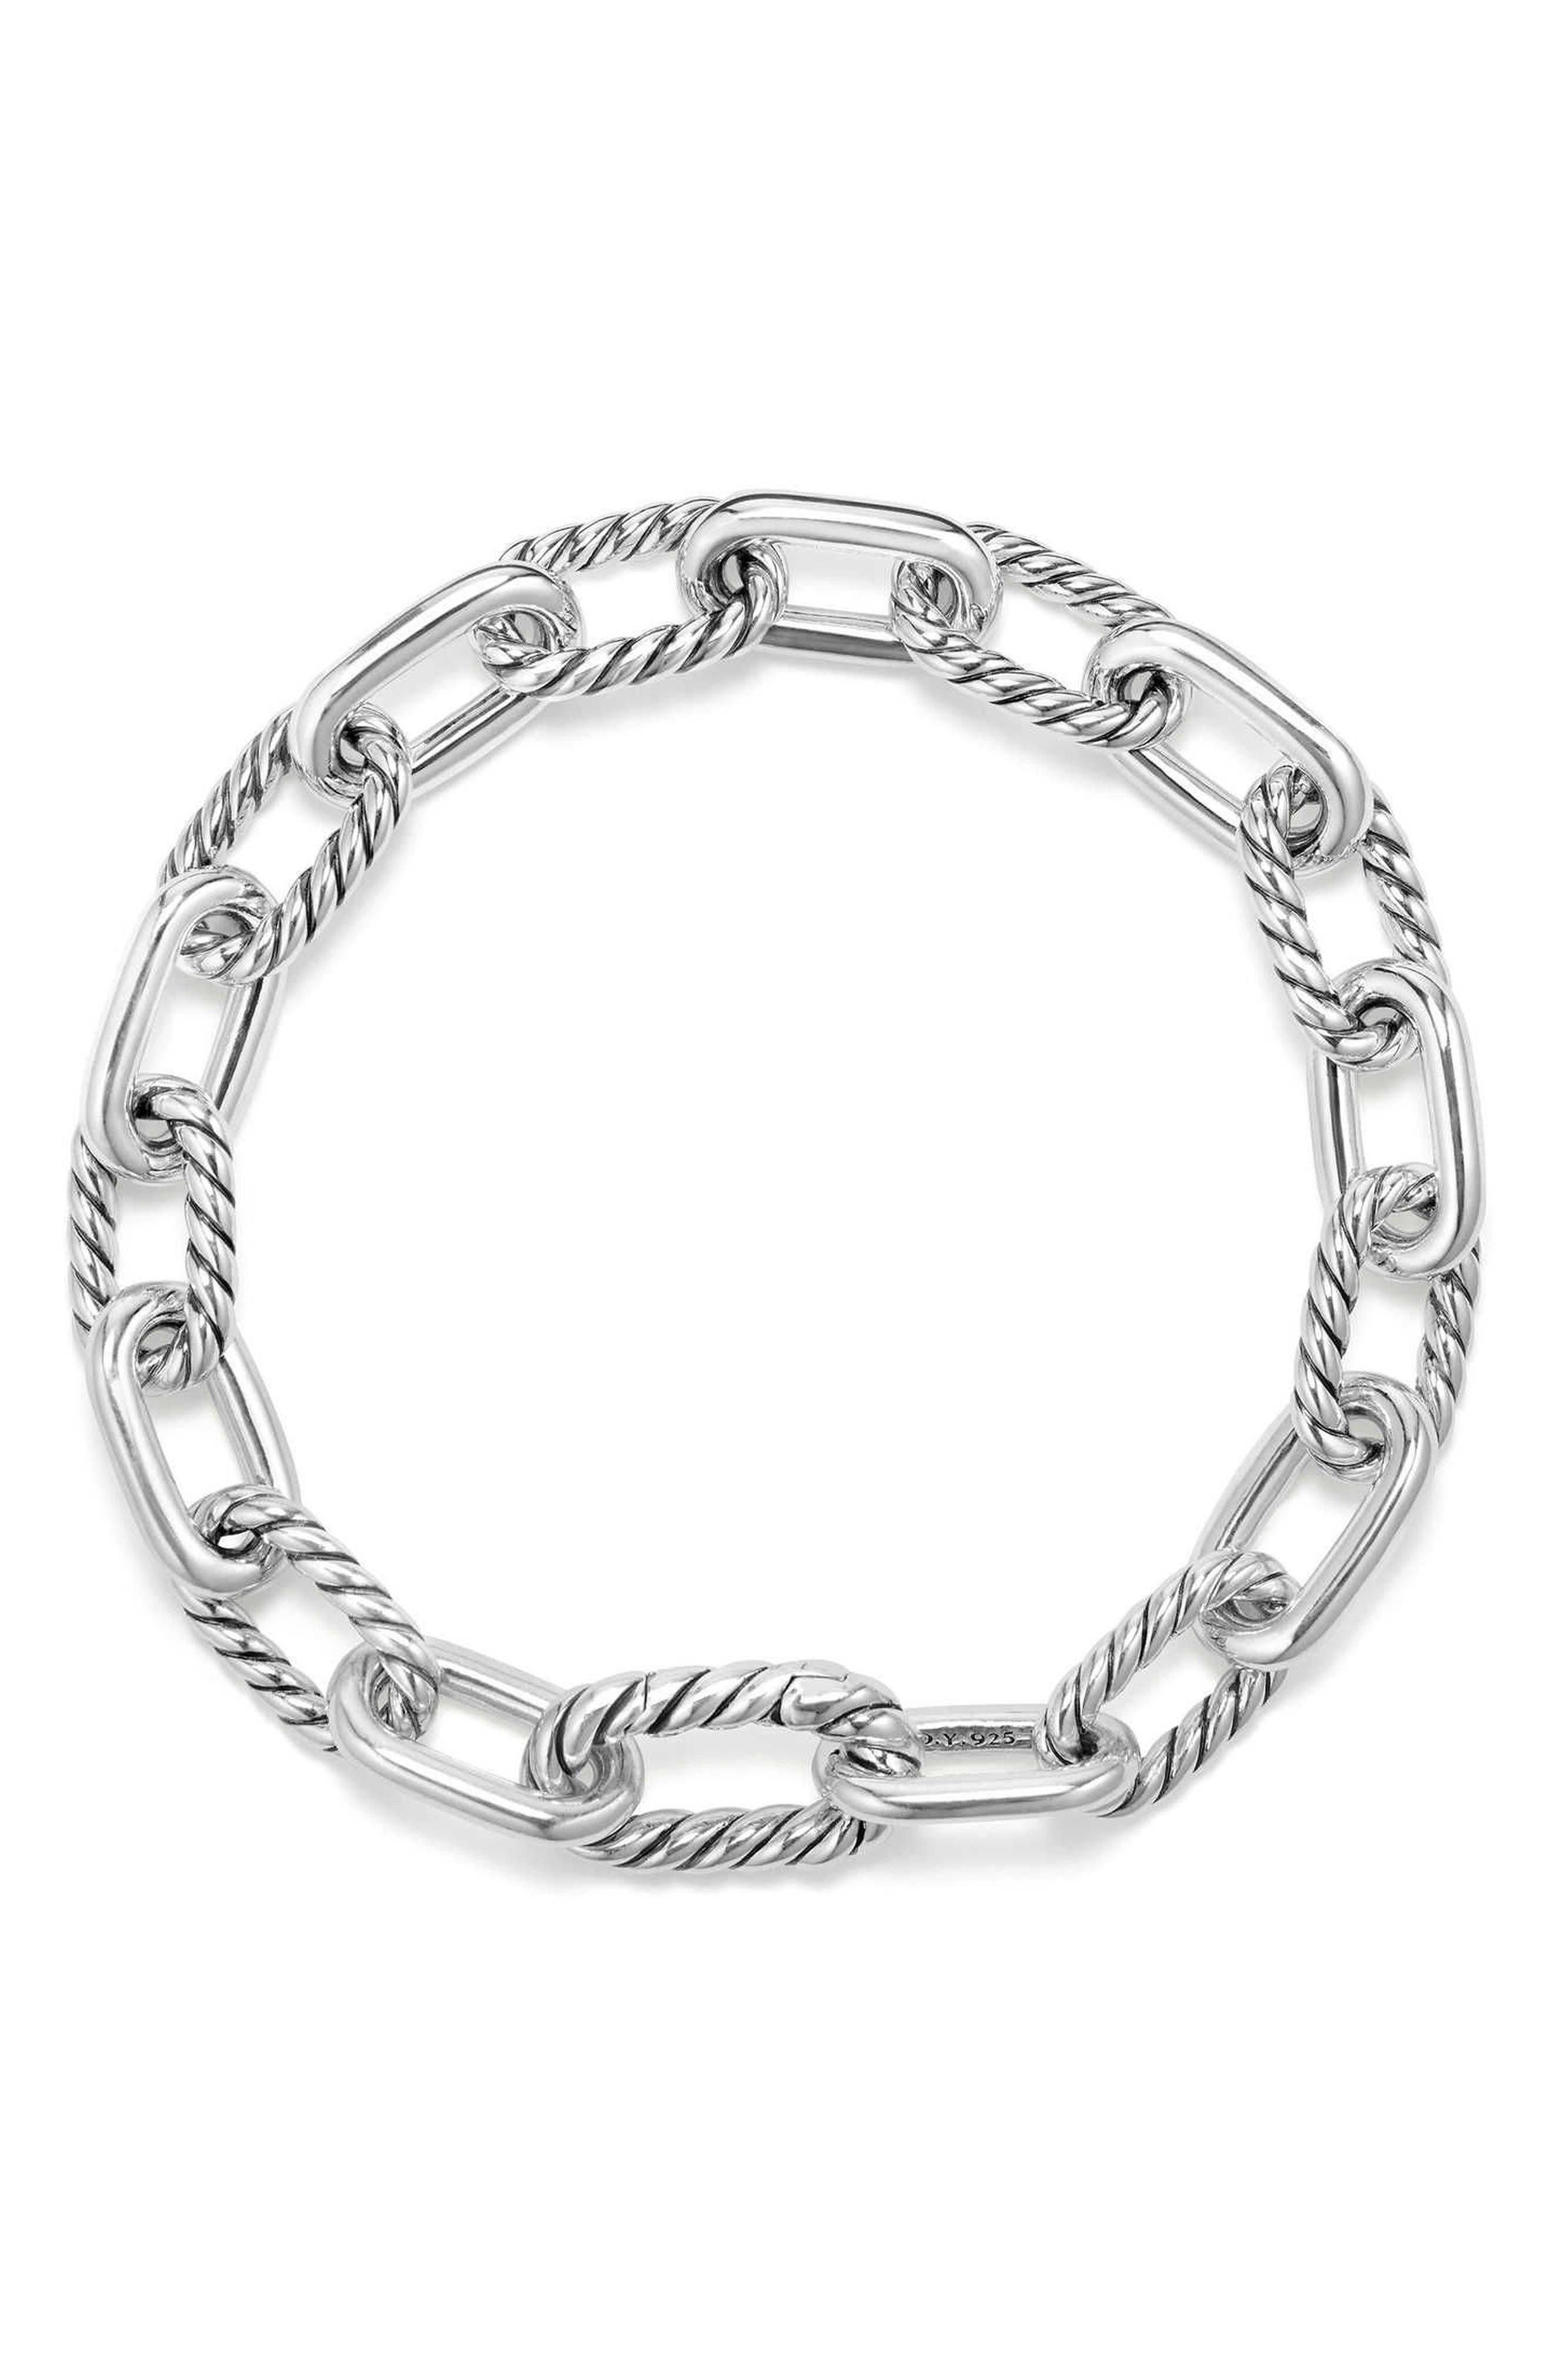 DAVID YURMAN, DY Madison Chain Small Bracelet, Alternate thumbnail 3, color, 040